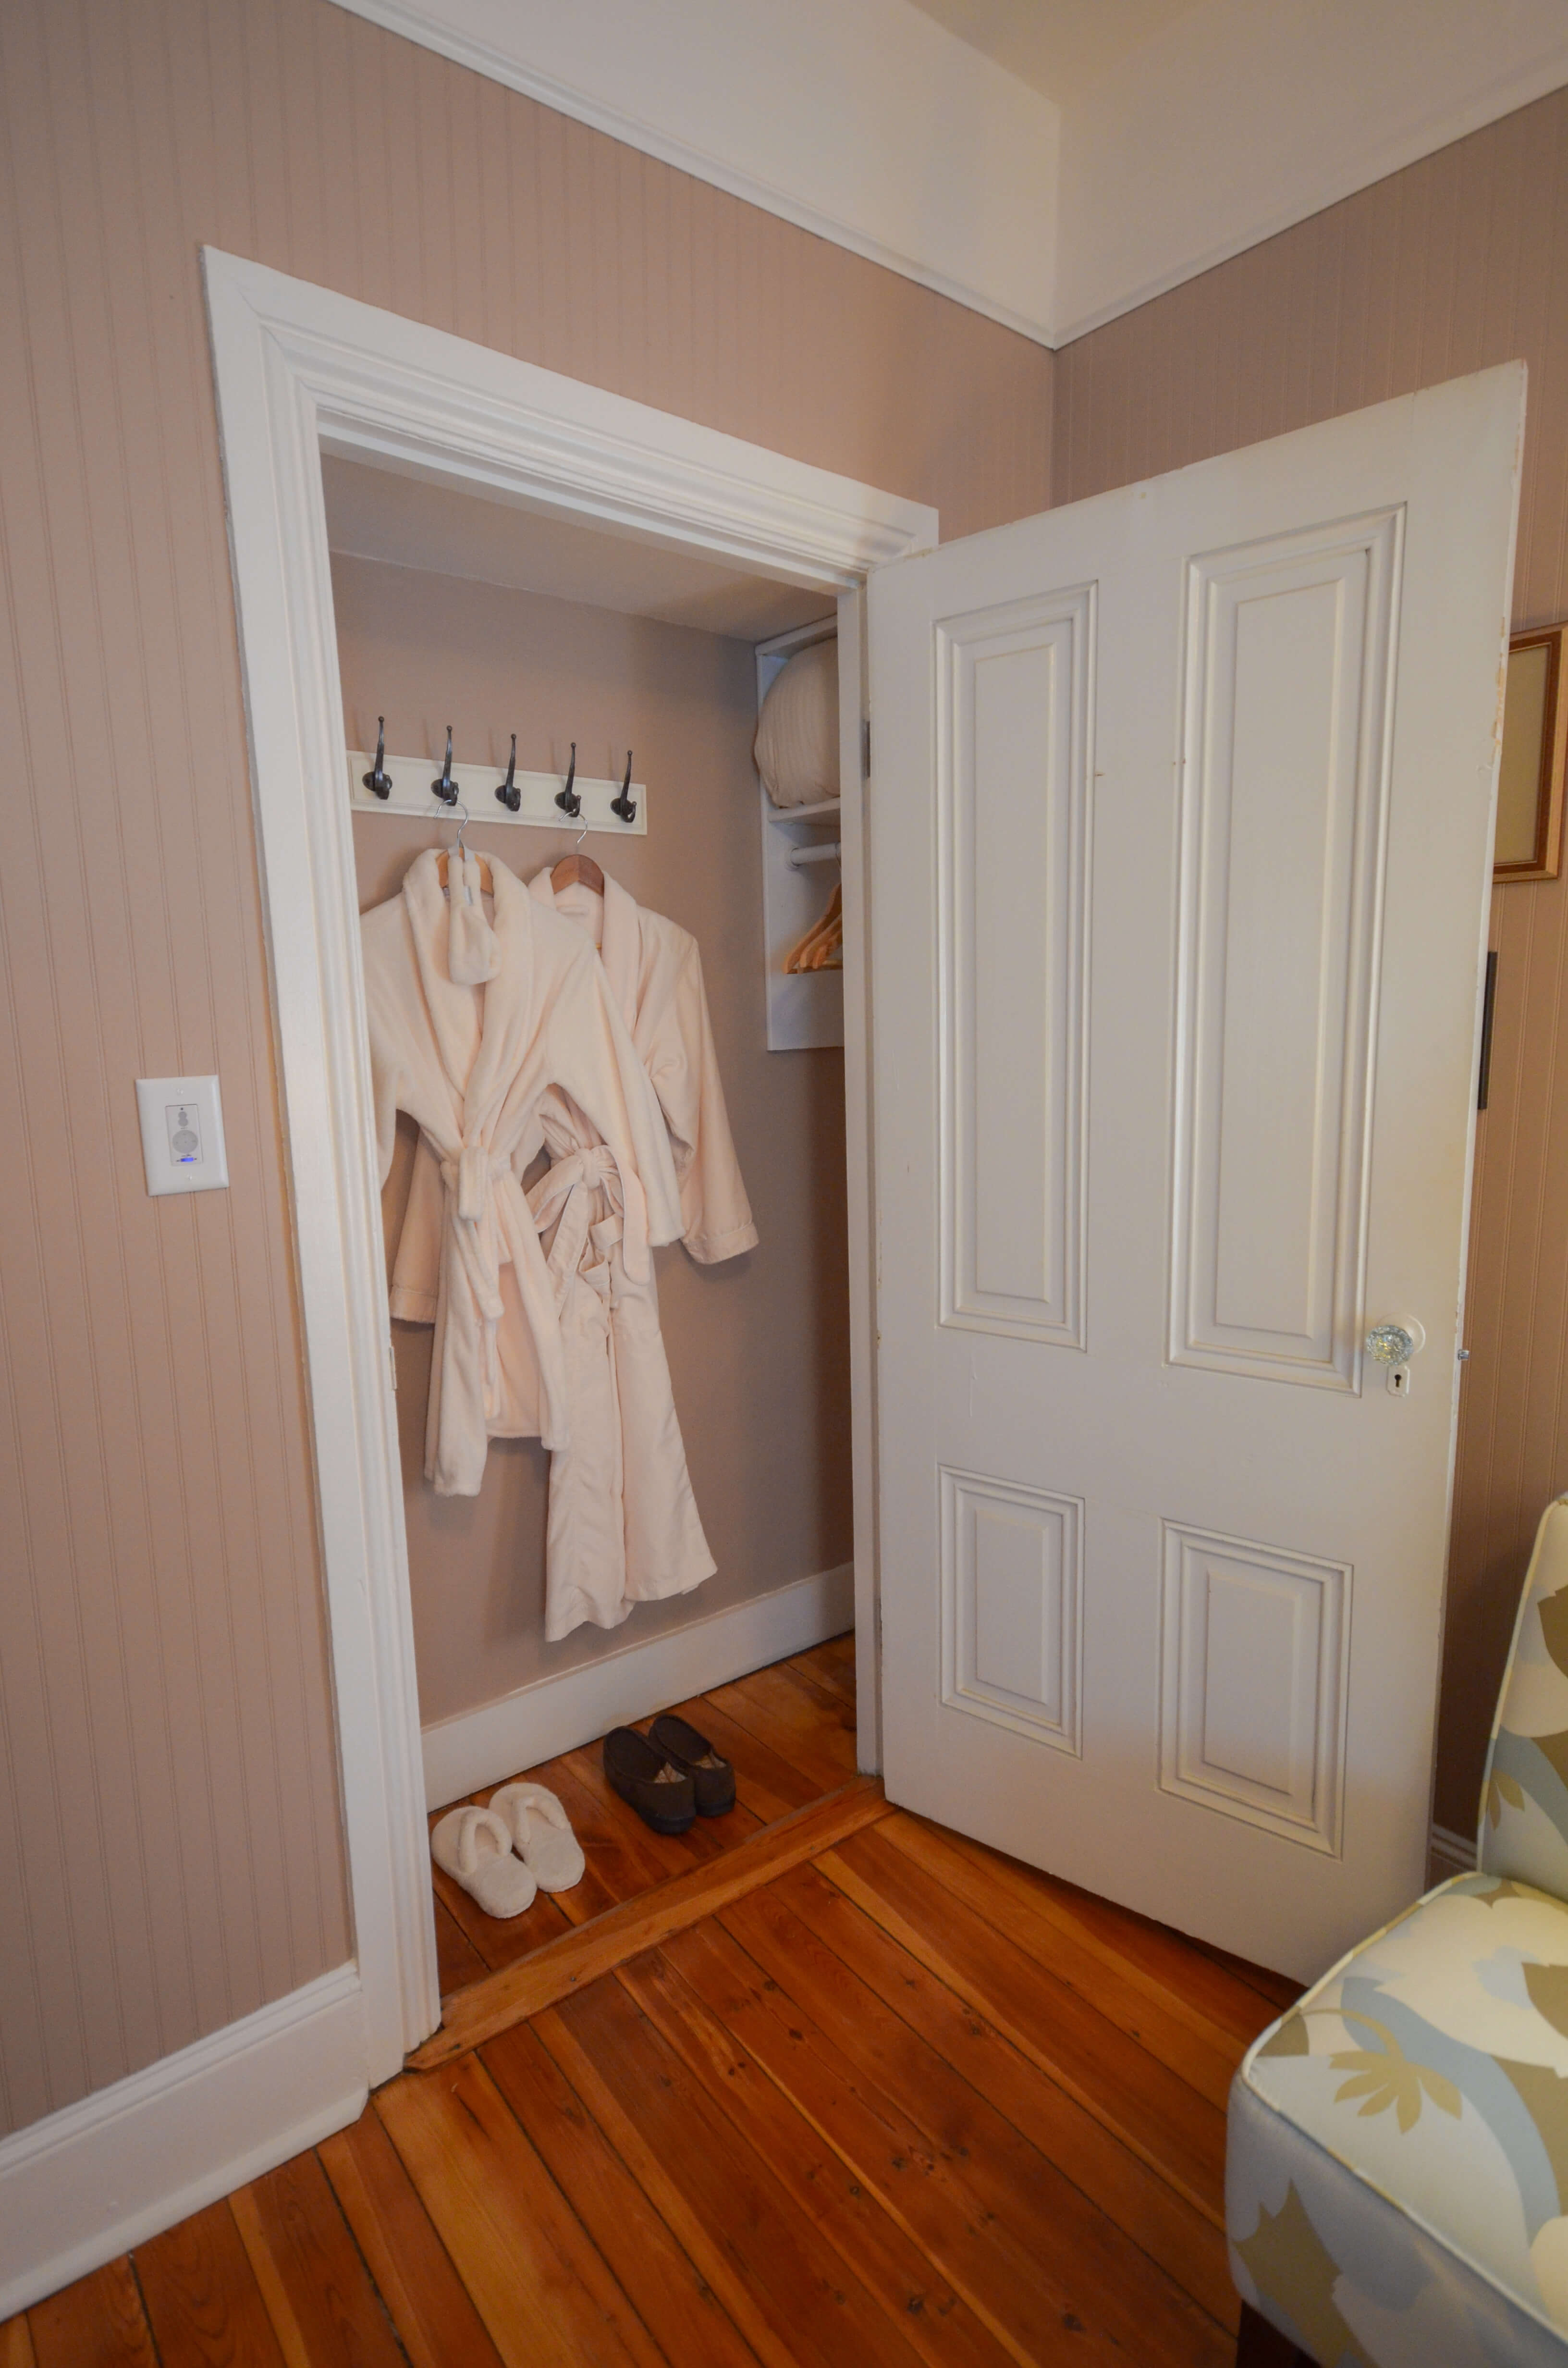 Plush bathrobes in each room - Waypoint House B+B